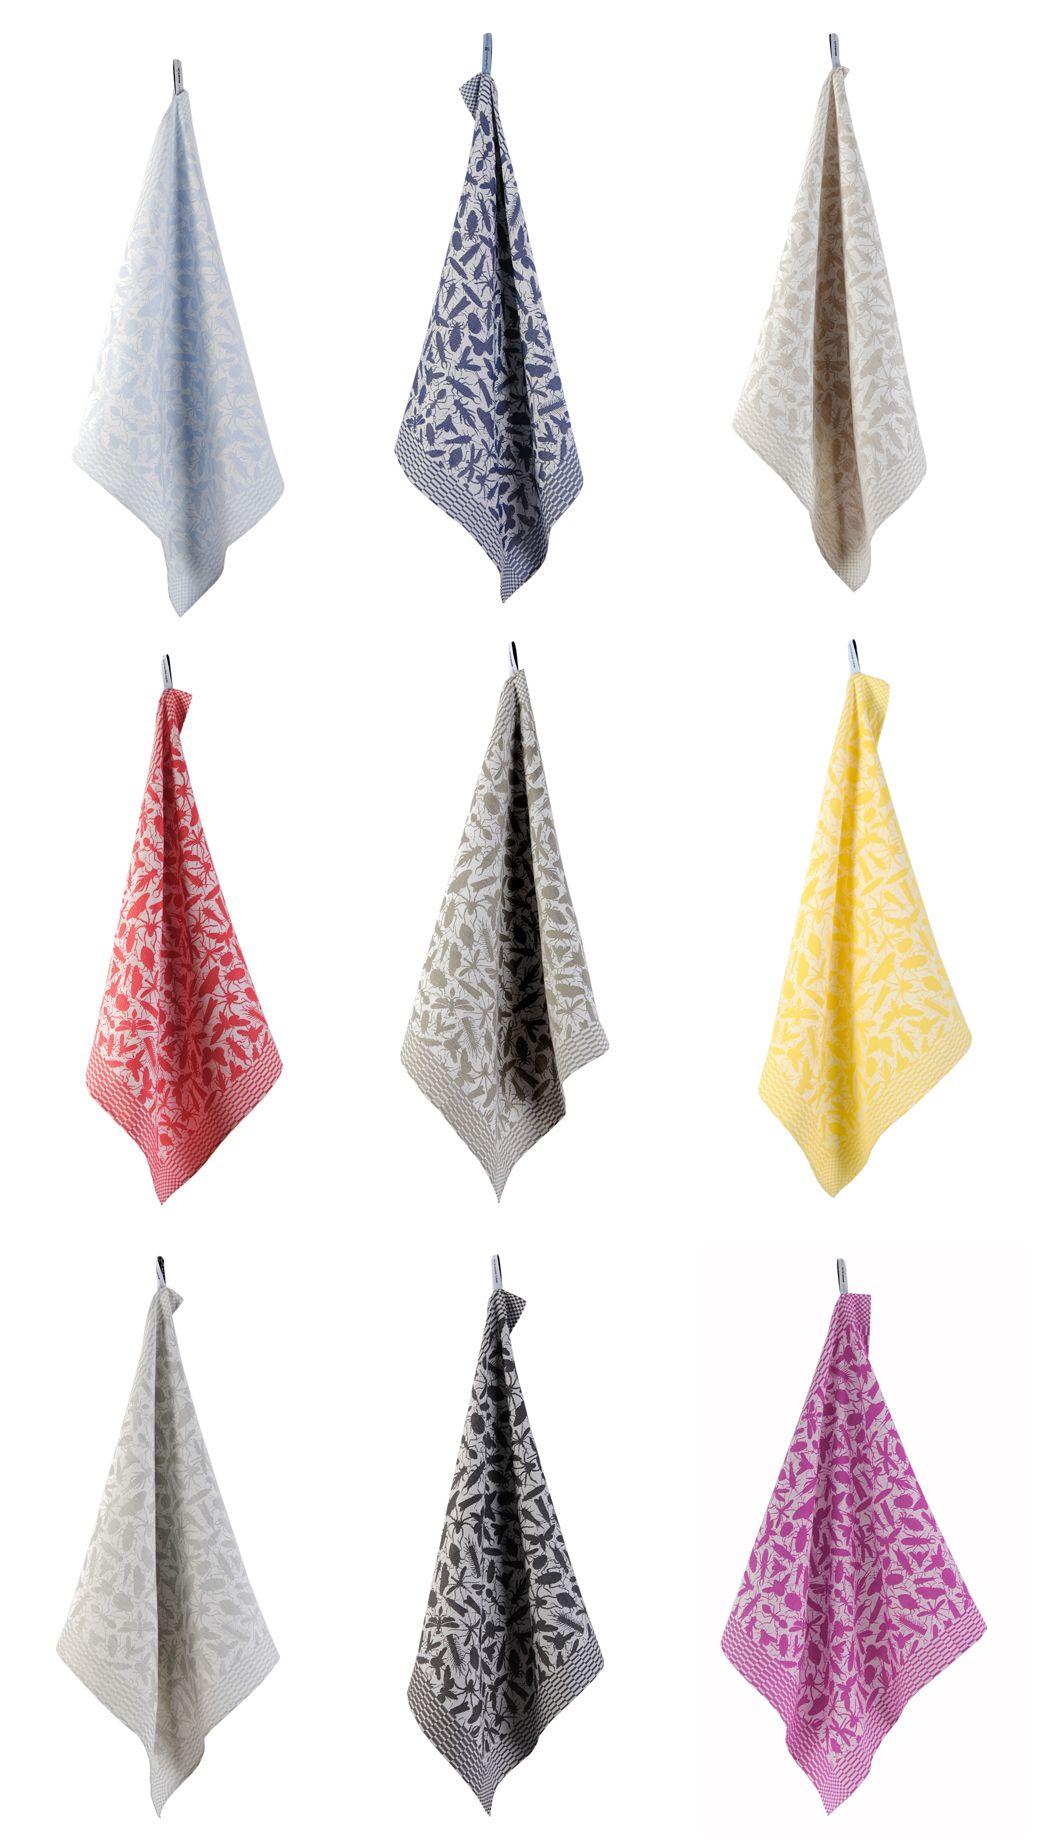 Insecten Tea Towels By Studio Job Woven In The Textile Museum Netherlands